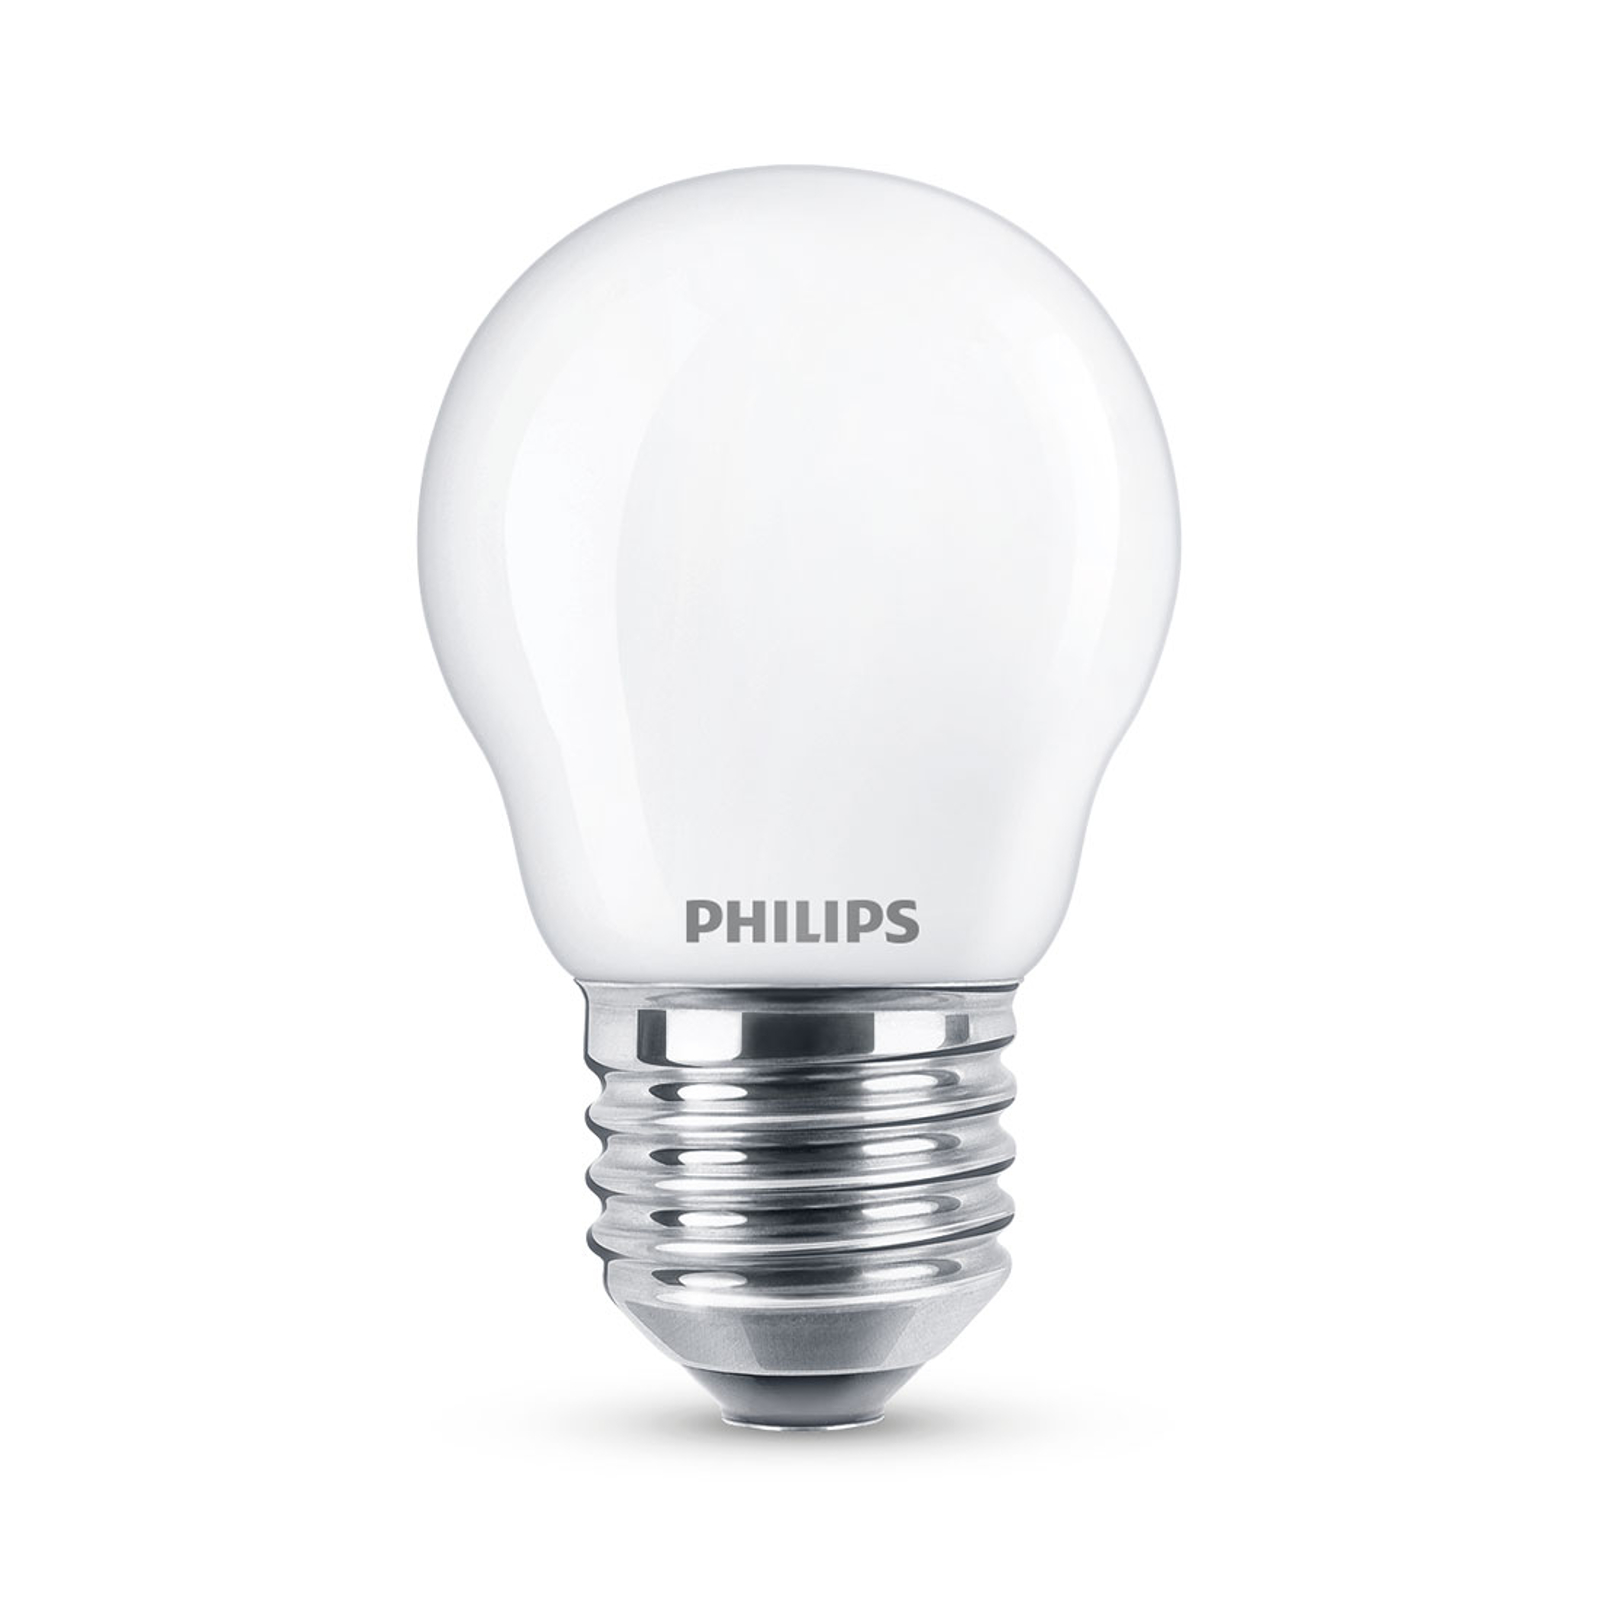 Philips Classic LED-Lampe E27 P45 6,5W 2.700K matt